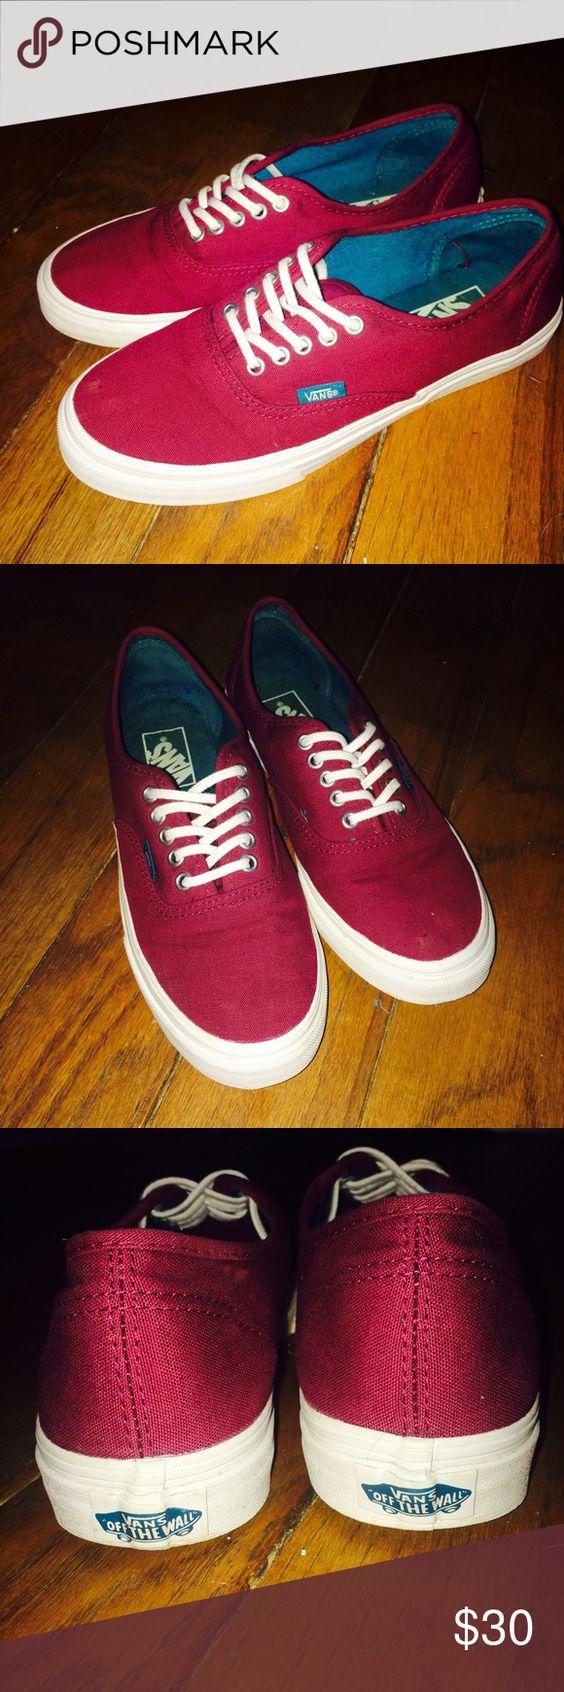 Garnet Red Vans Garnet Red Vans, worn once. Size 7 women/5 men. Bought at $60, selling for $30. Vans Shoes Sneakers